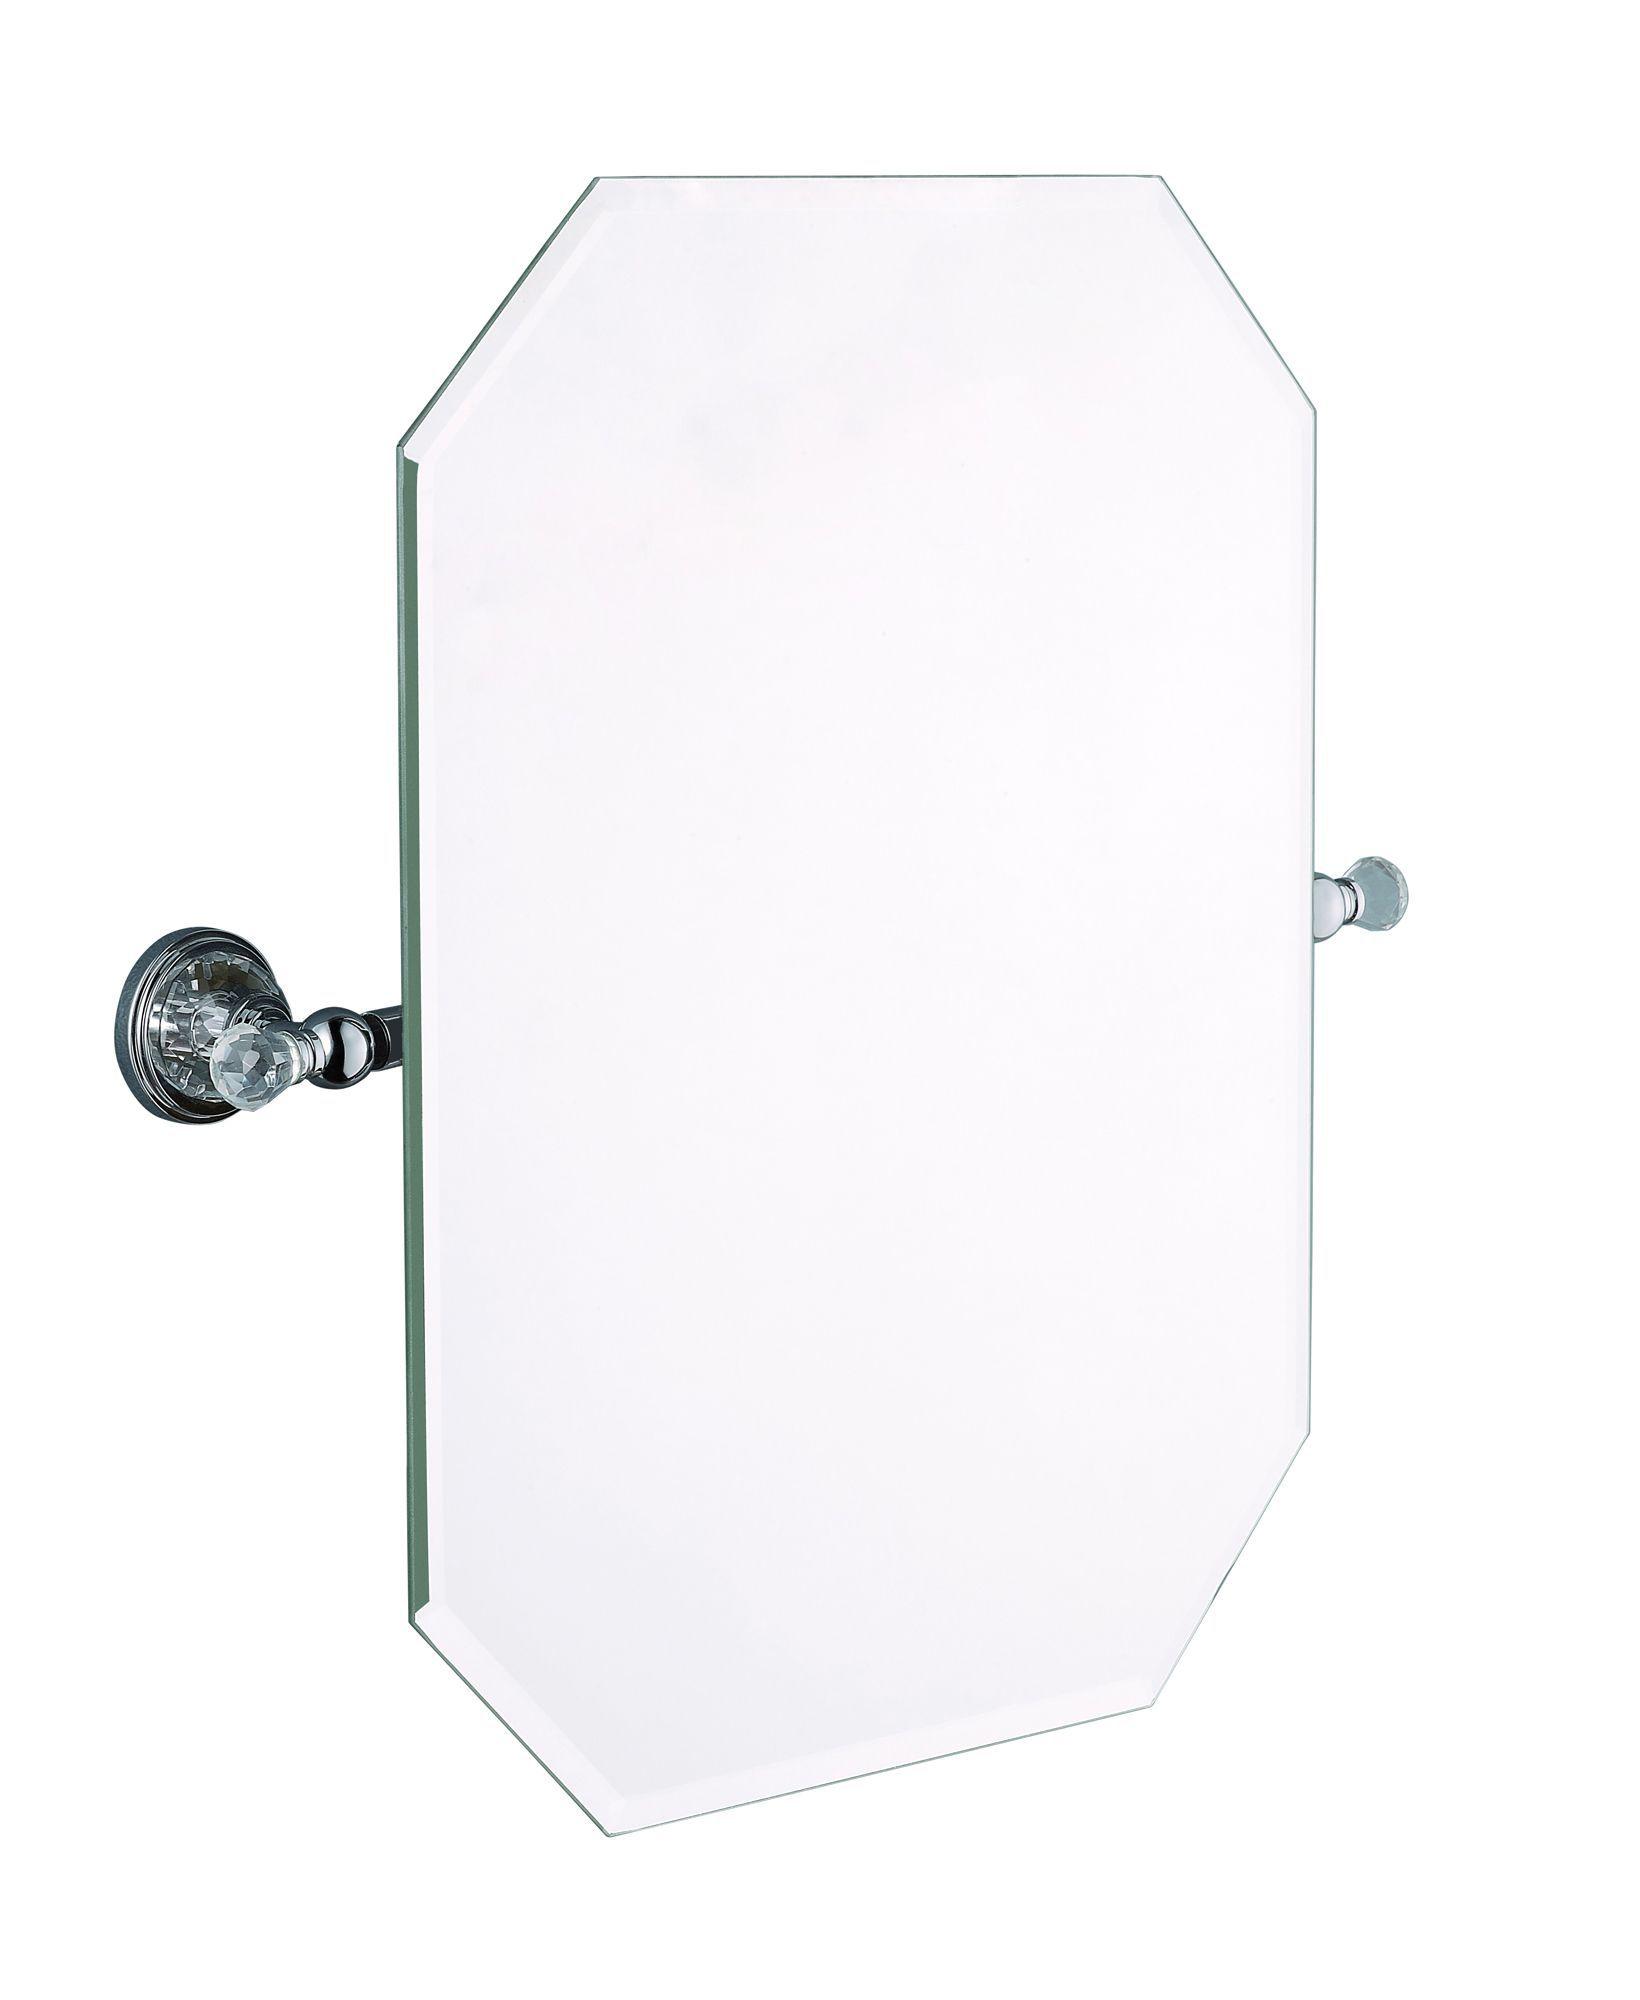 Cooke lewis eva octagon wall mirror w 500mm h 507mm departments diy at b q